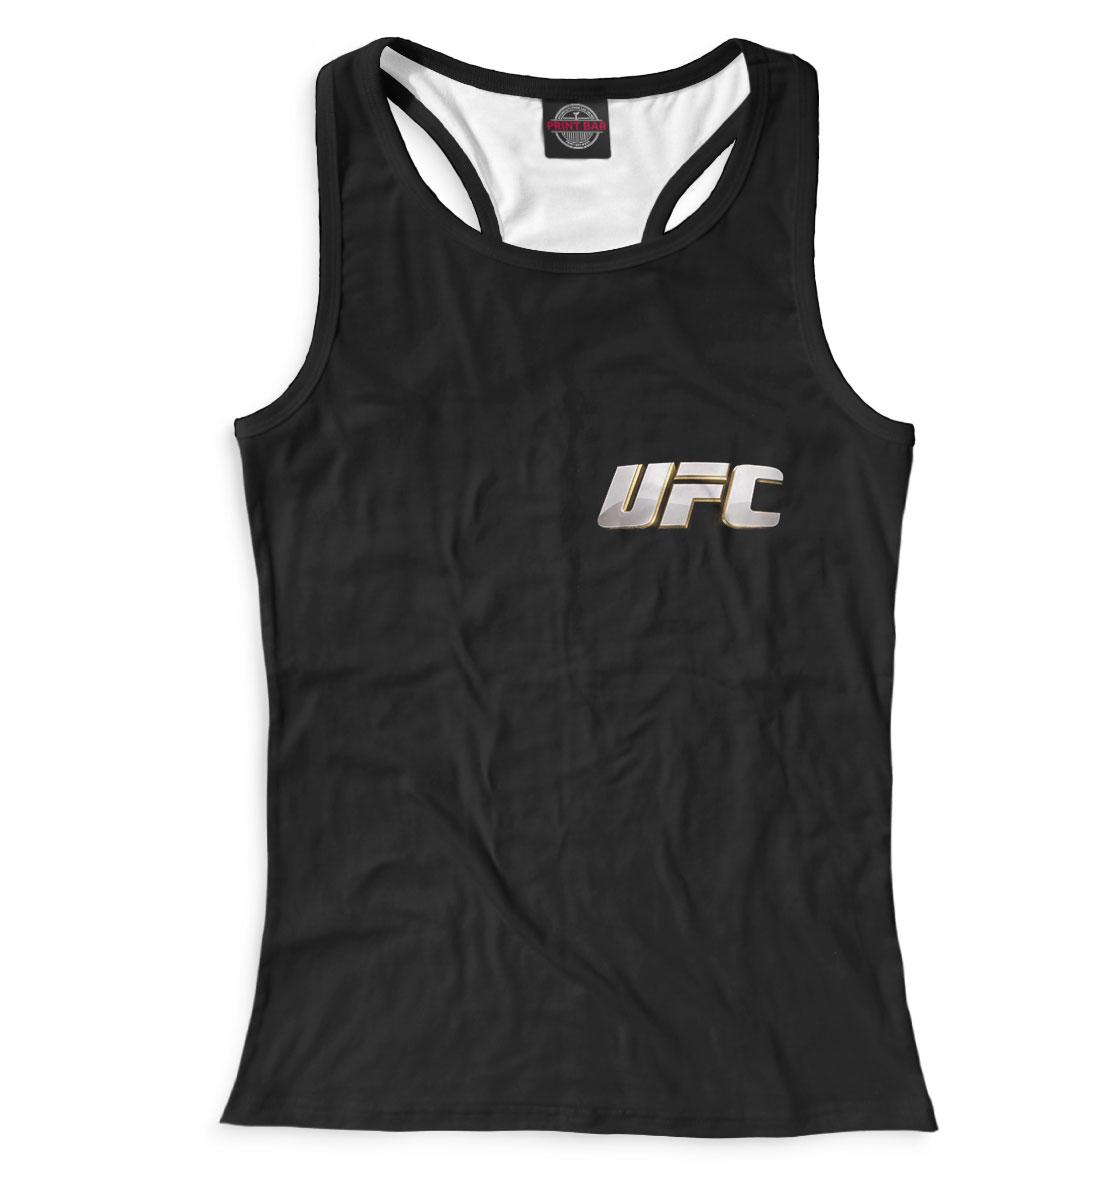 UFC, Printbar, Майки борцовки, MNU-334626-mayb-1  - купить со скидкой